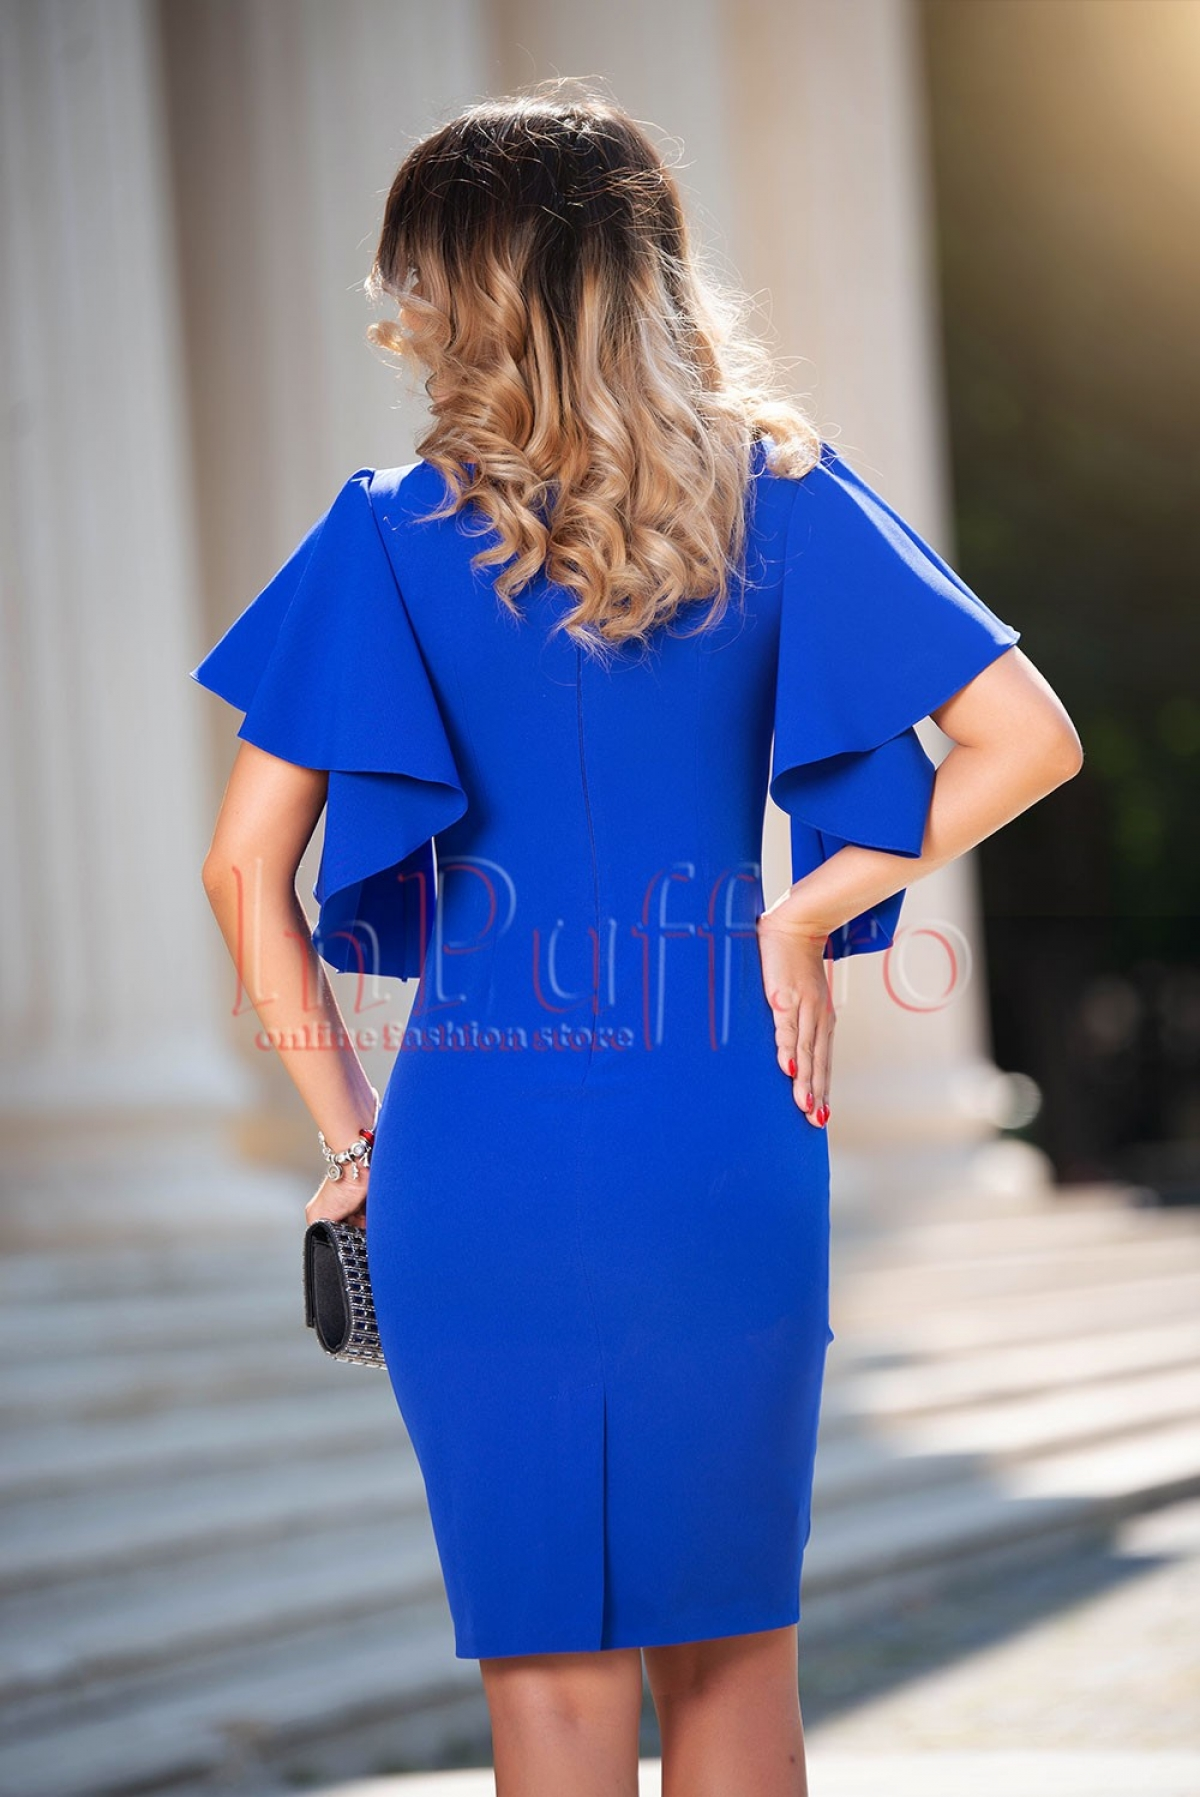 Rochie MBG midi albastra cu volane in zona manecilor si accesoriu pretios la umar